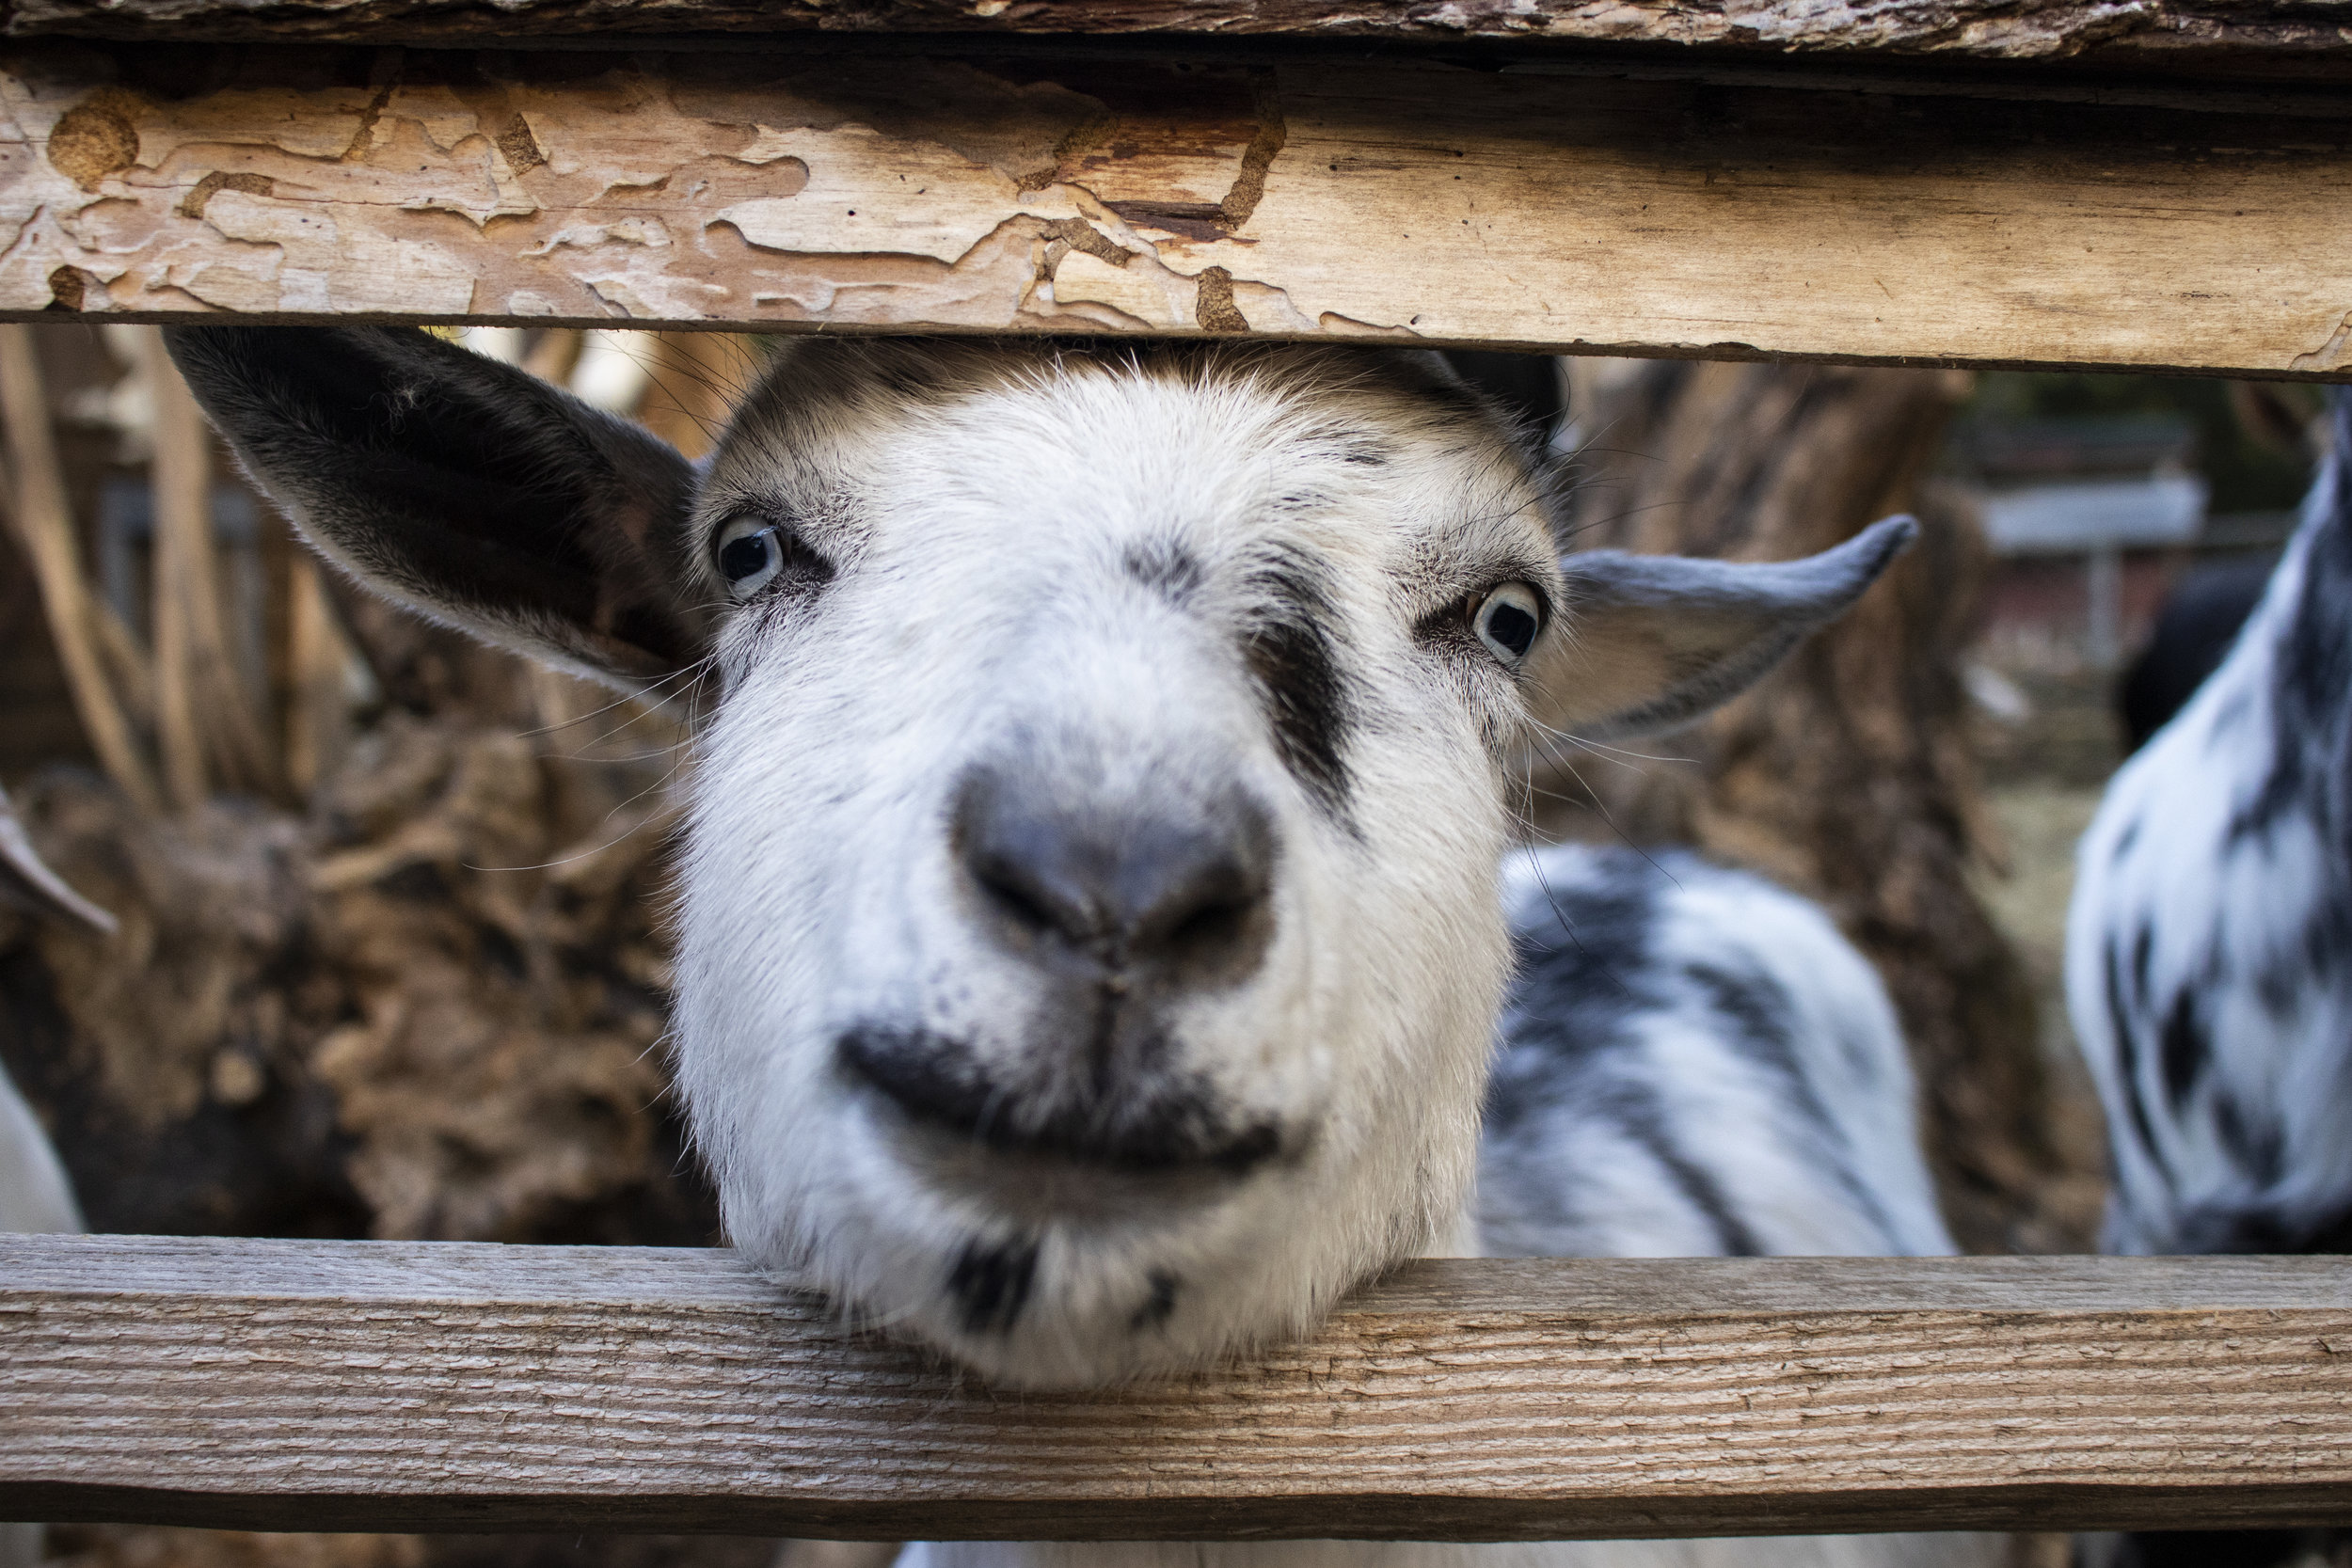 goat_close_up.jpg